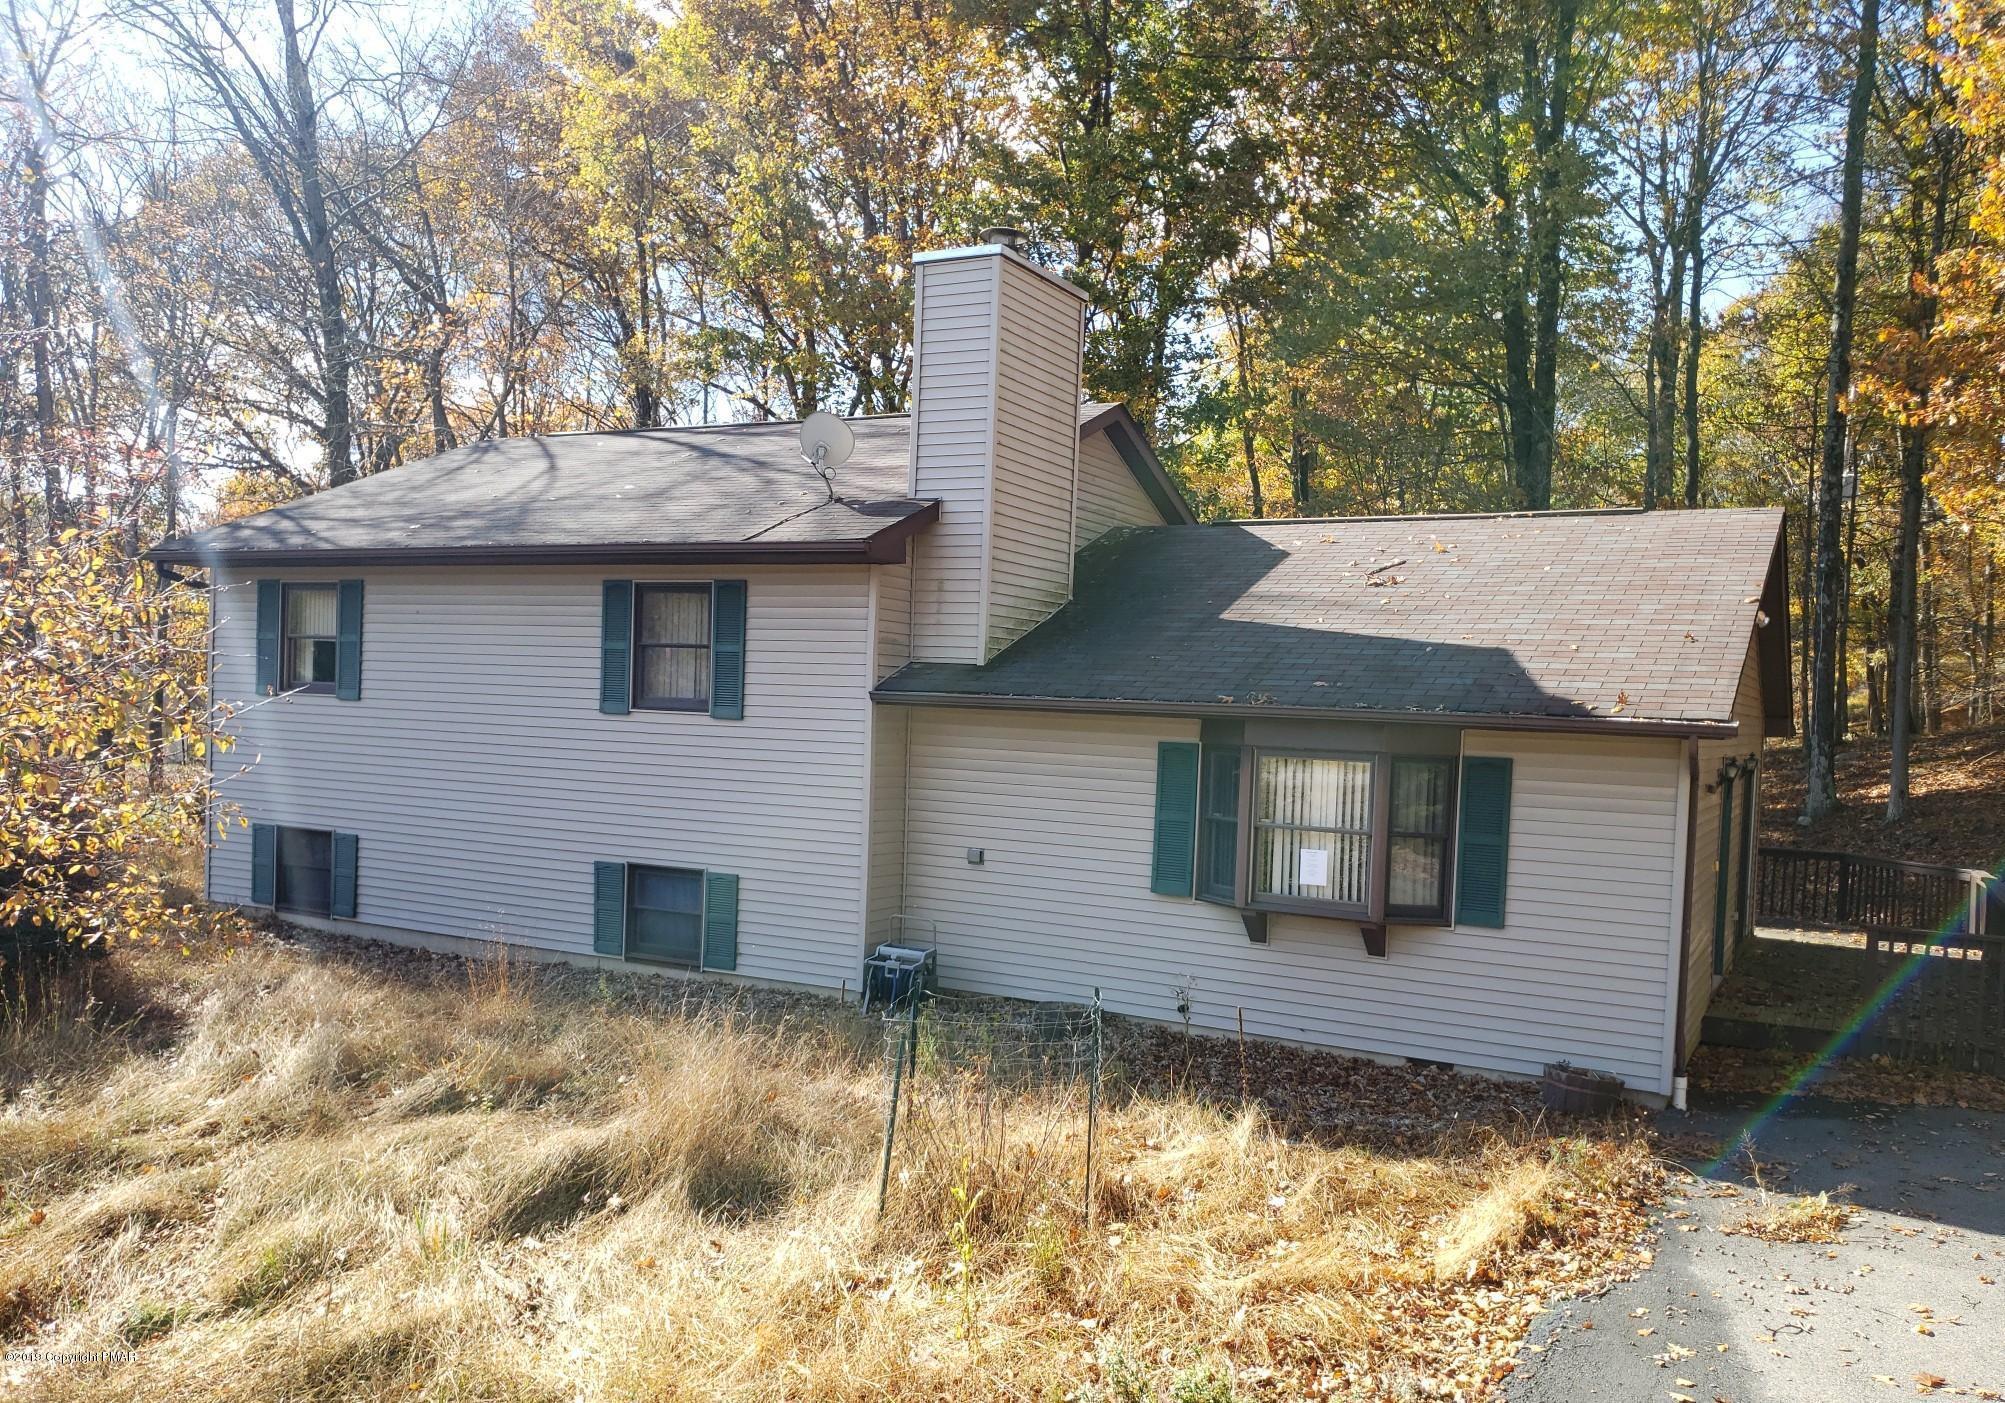 102 Daventry Ct, Bushkill, PA 18324